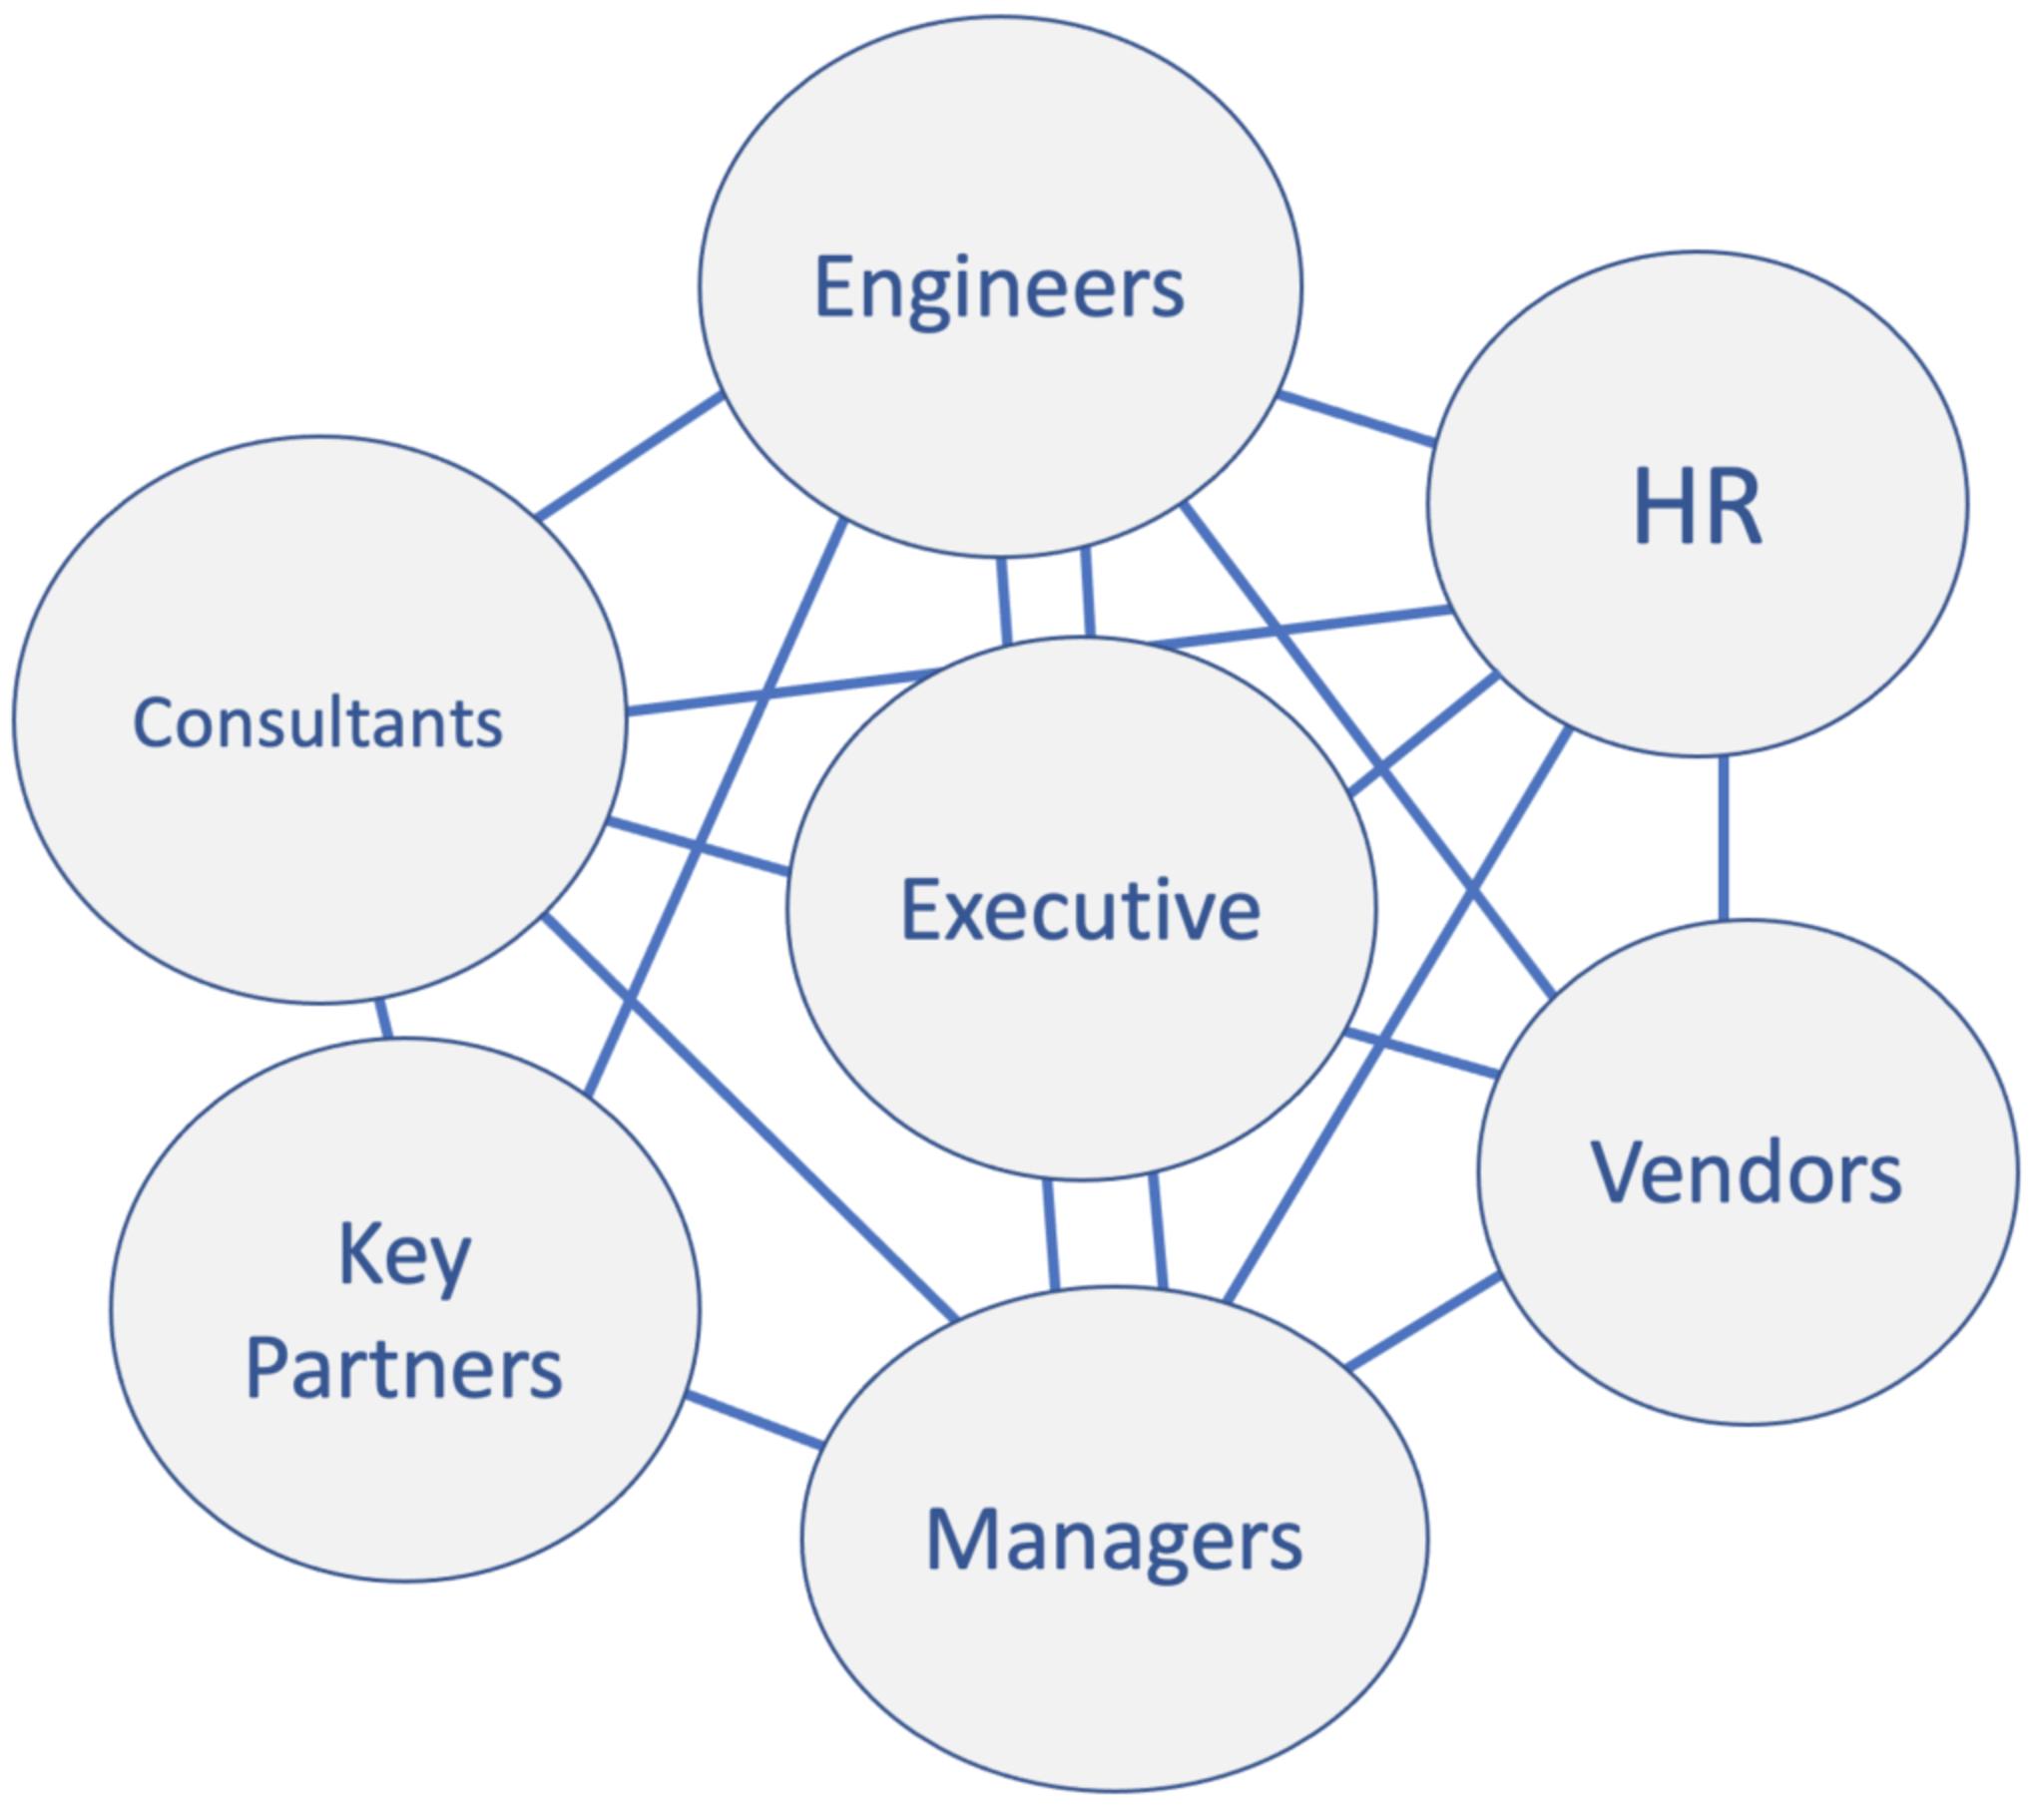 An example of a network organizational chart